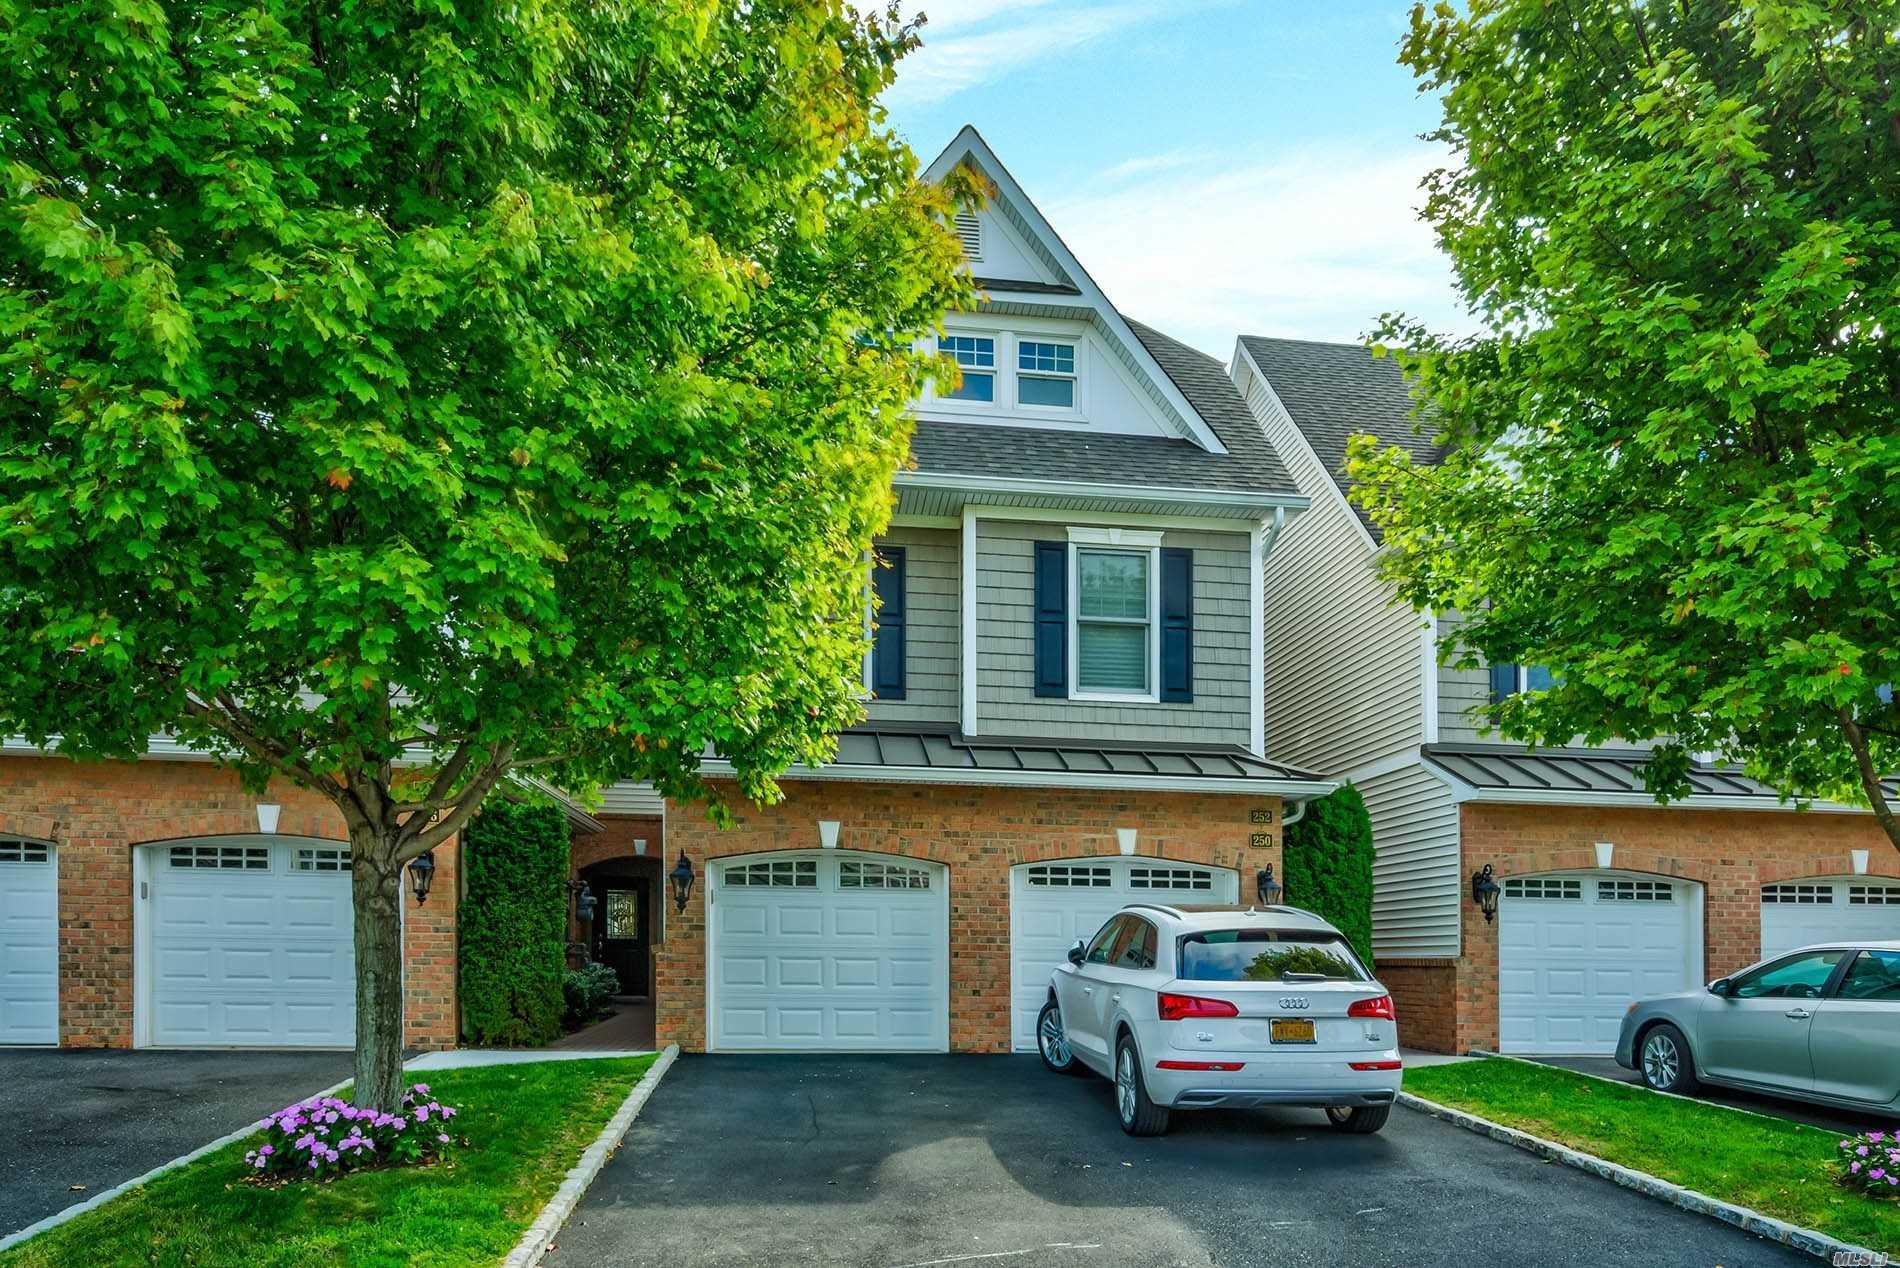 Property for sale at 250 Roosevelt Way, Westbury NY 11590, Westbury,  New York 11590